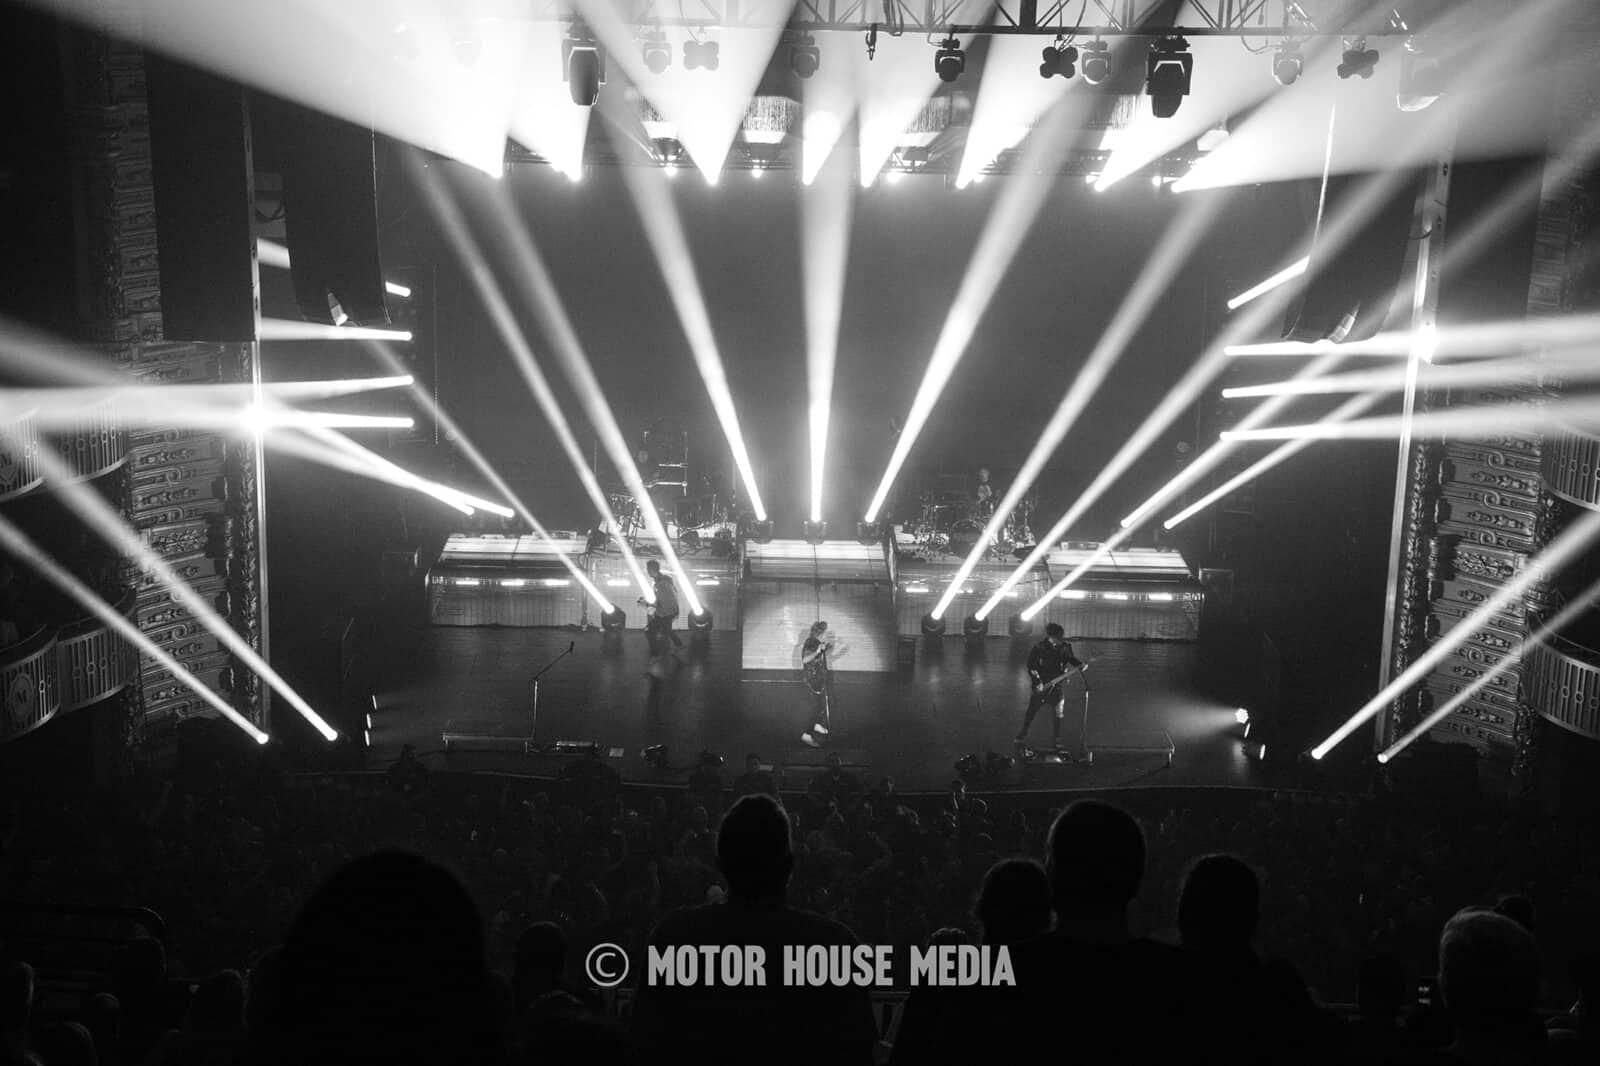 Papa Roach's amazing stage show